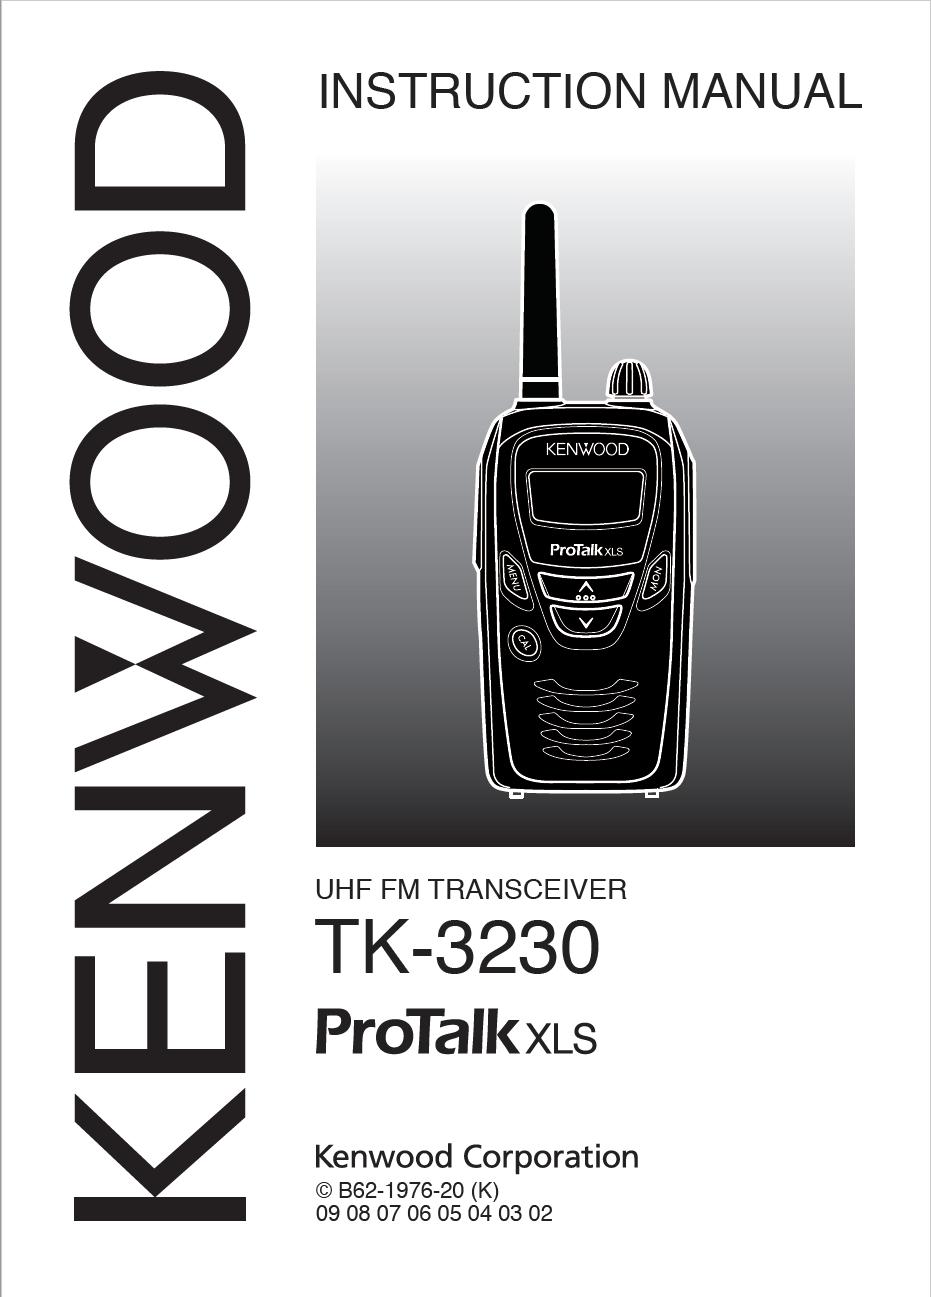 TK-3230_B62-1976-20 Manual